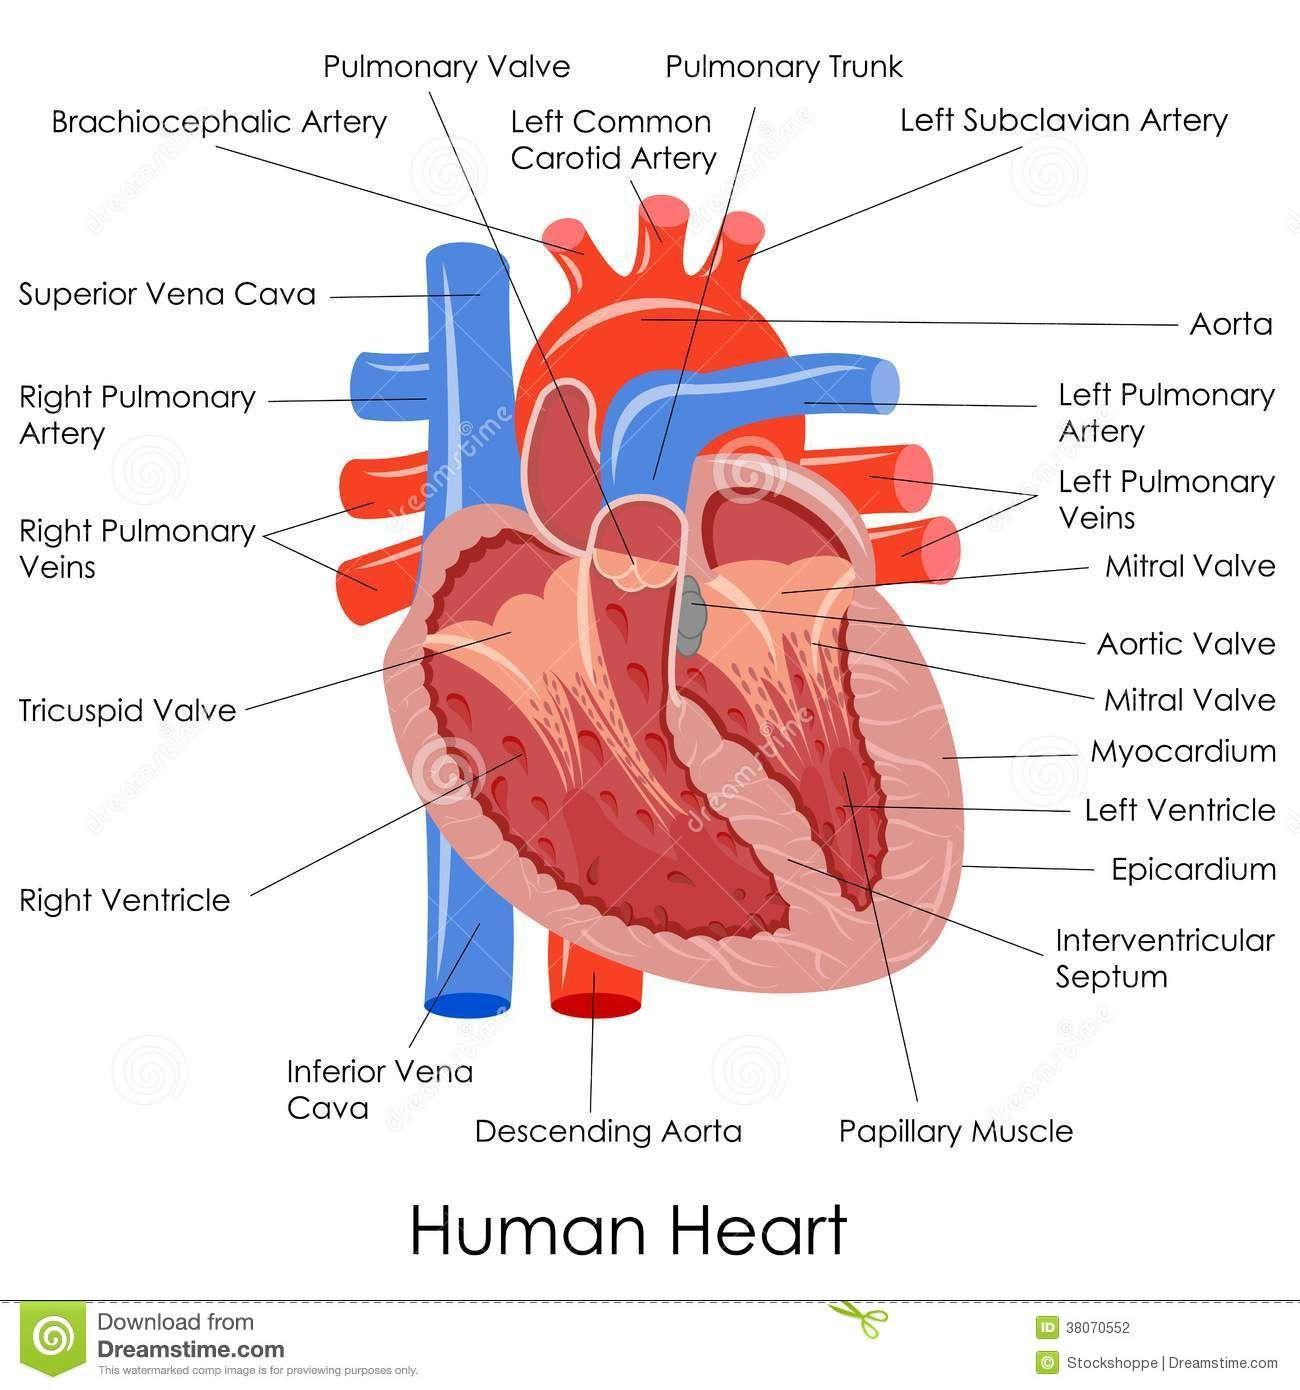 Human Cardiac Anatomy Human Cardiac Anatomy Human Heart